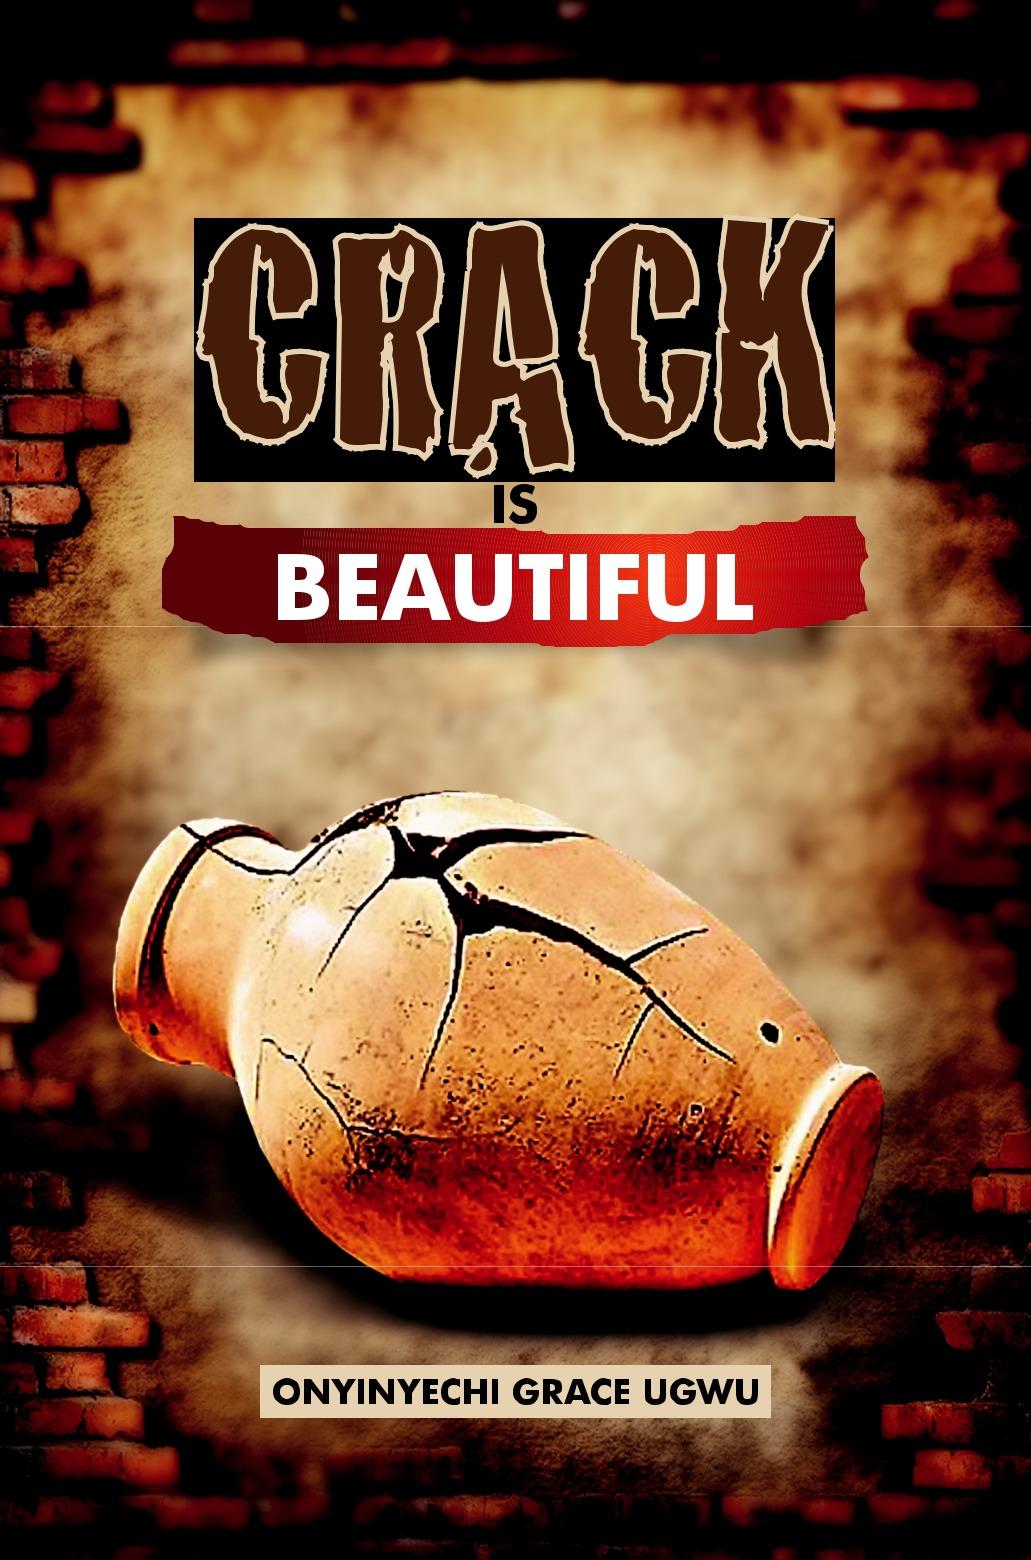 CRACK is BEAUTIFUL